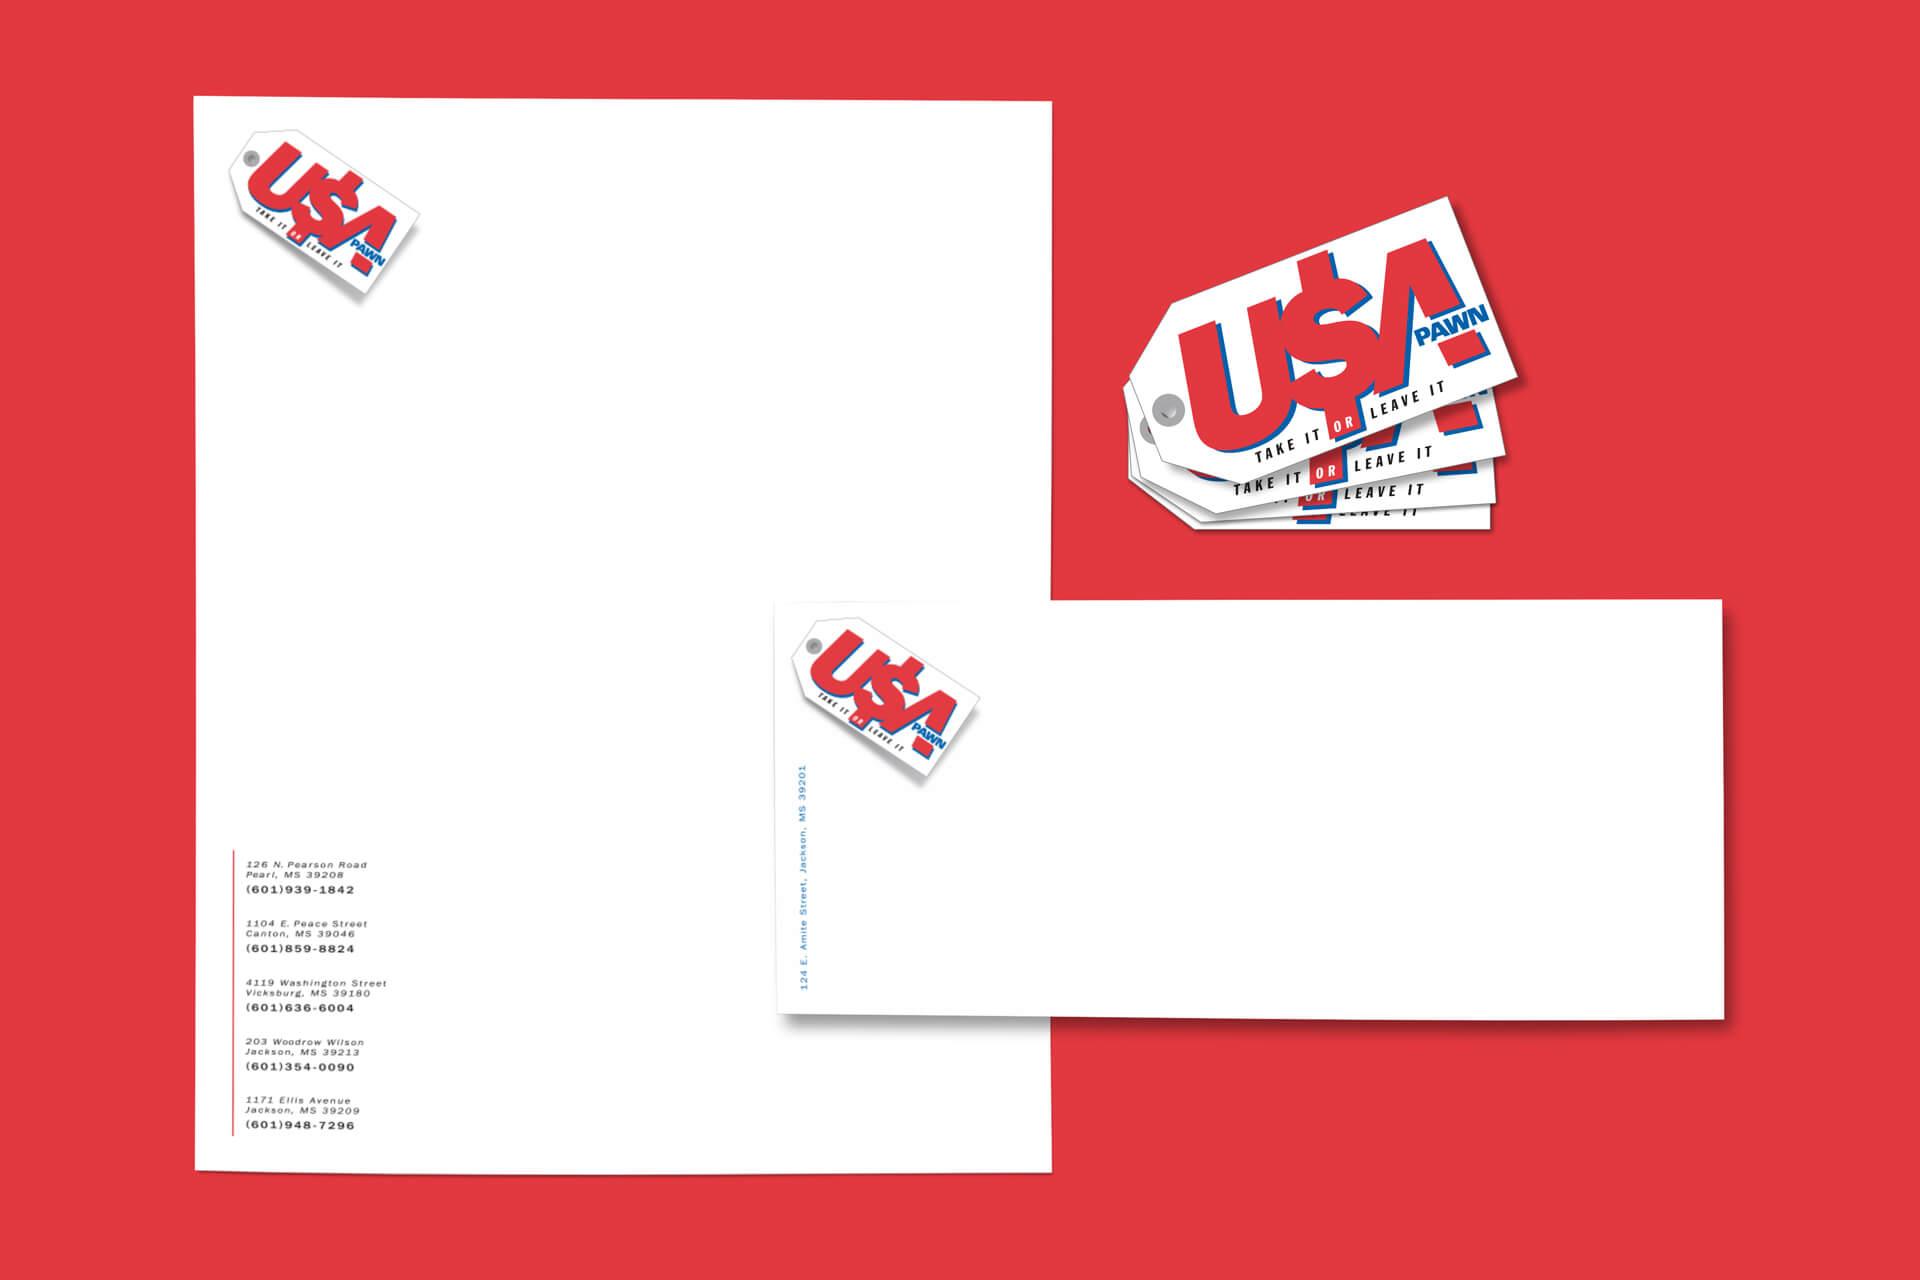 USA Pawn Branding Stationery Letterhead Design